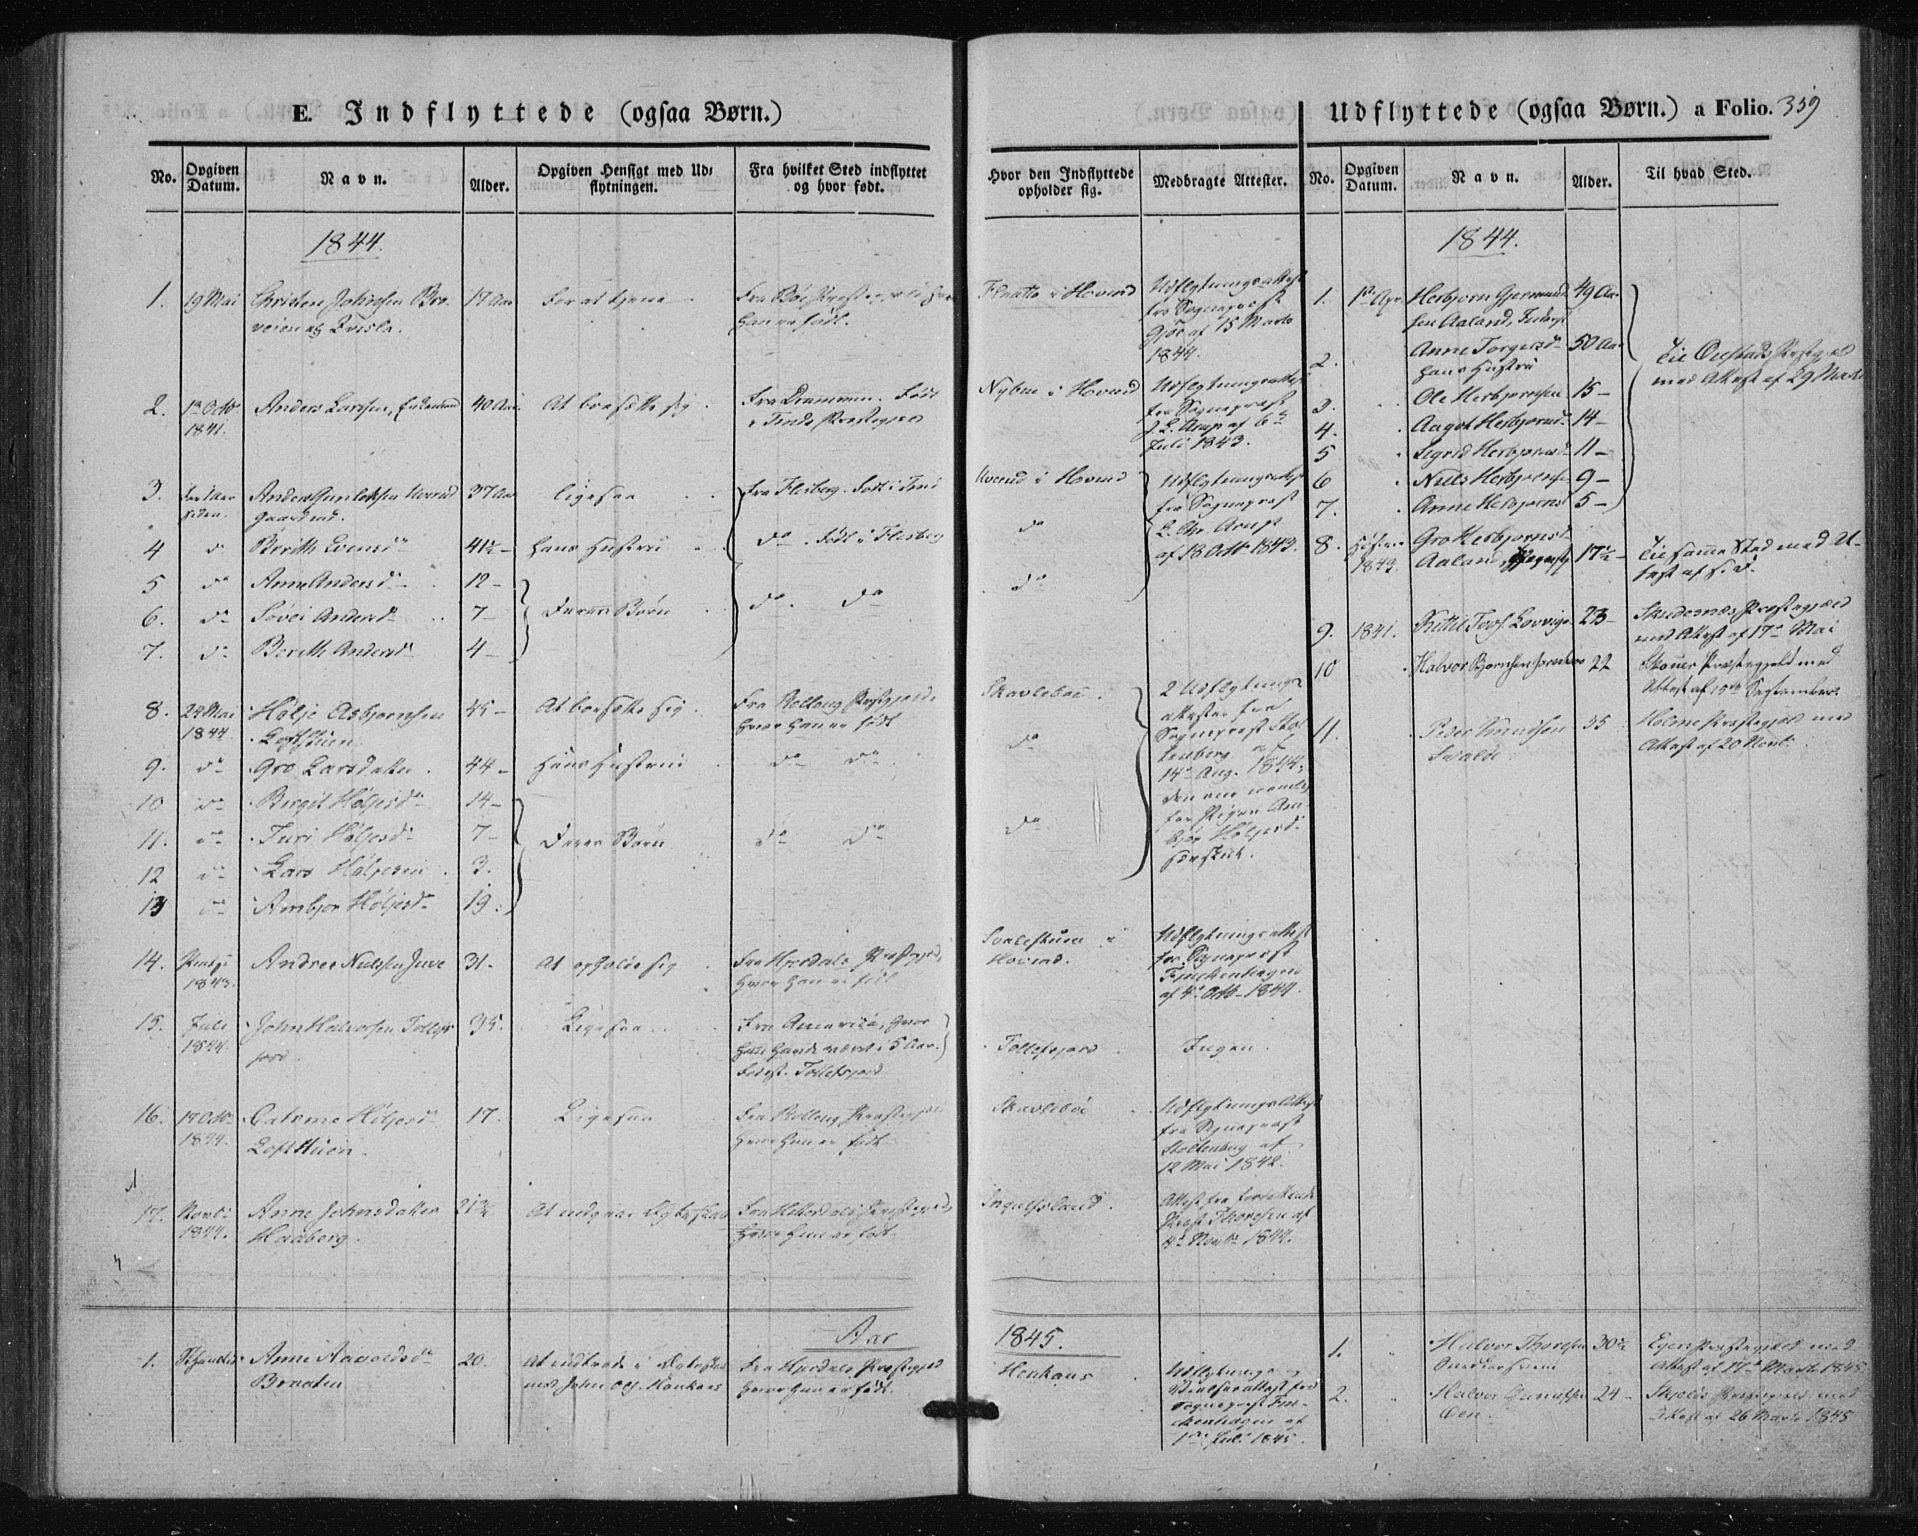 SAKO, Tinn kirkebøker, F/Fa/L0005: Ministerialbok nr. I 5, 1844-1856, s. 359